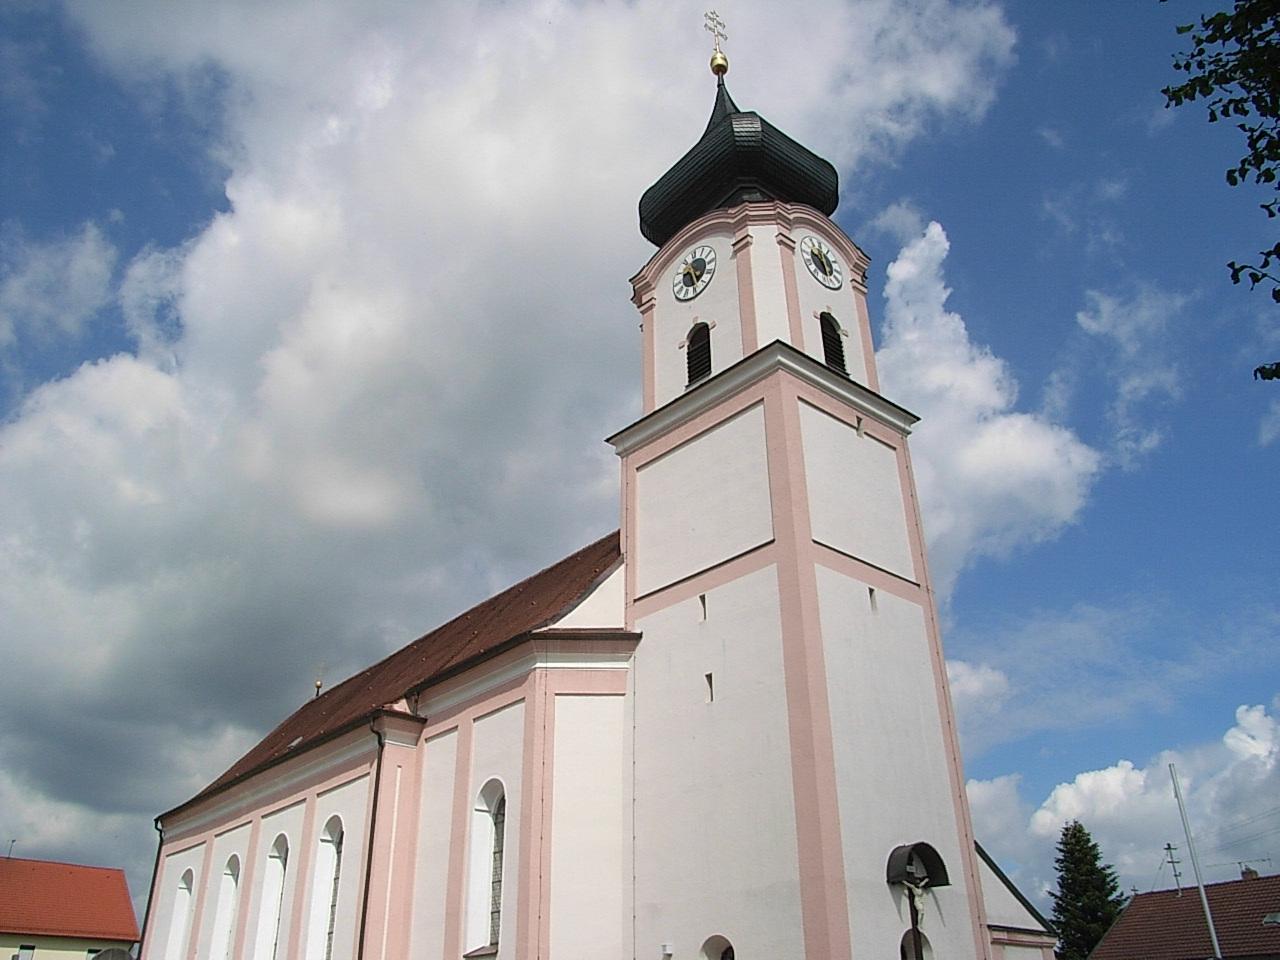 Pfarrkirche Roc39Fbach